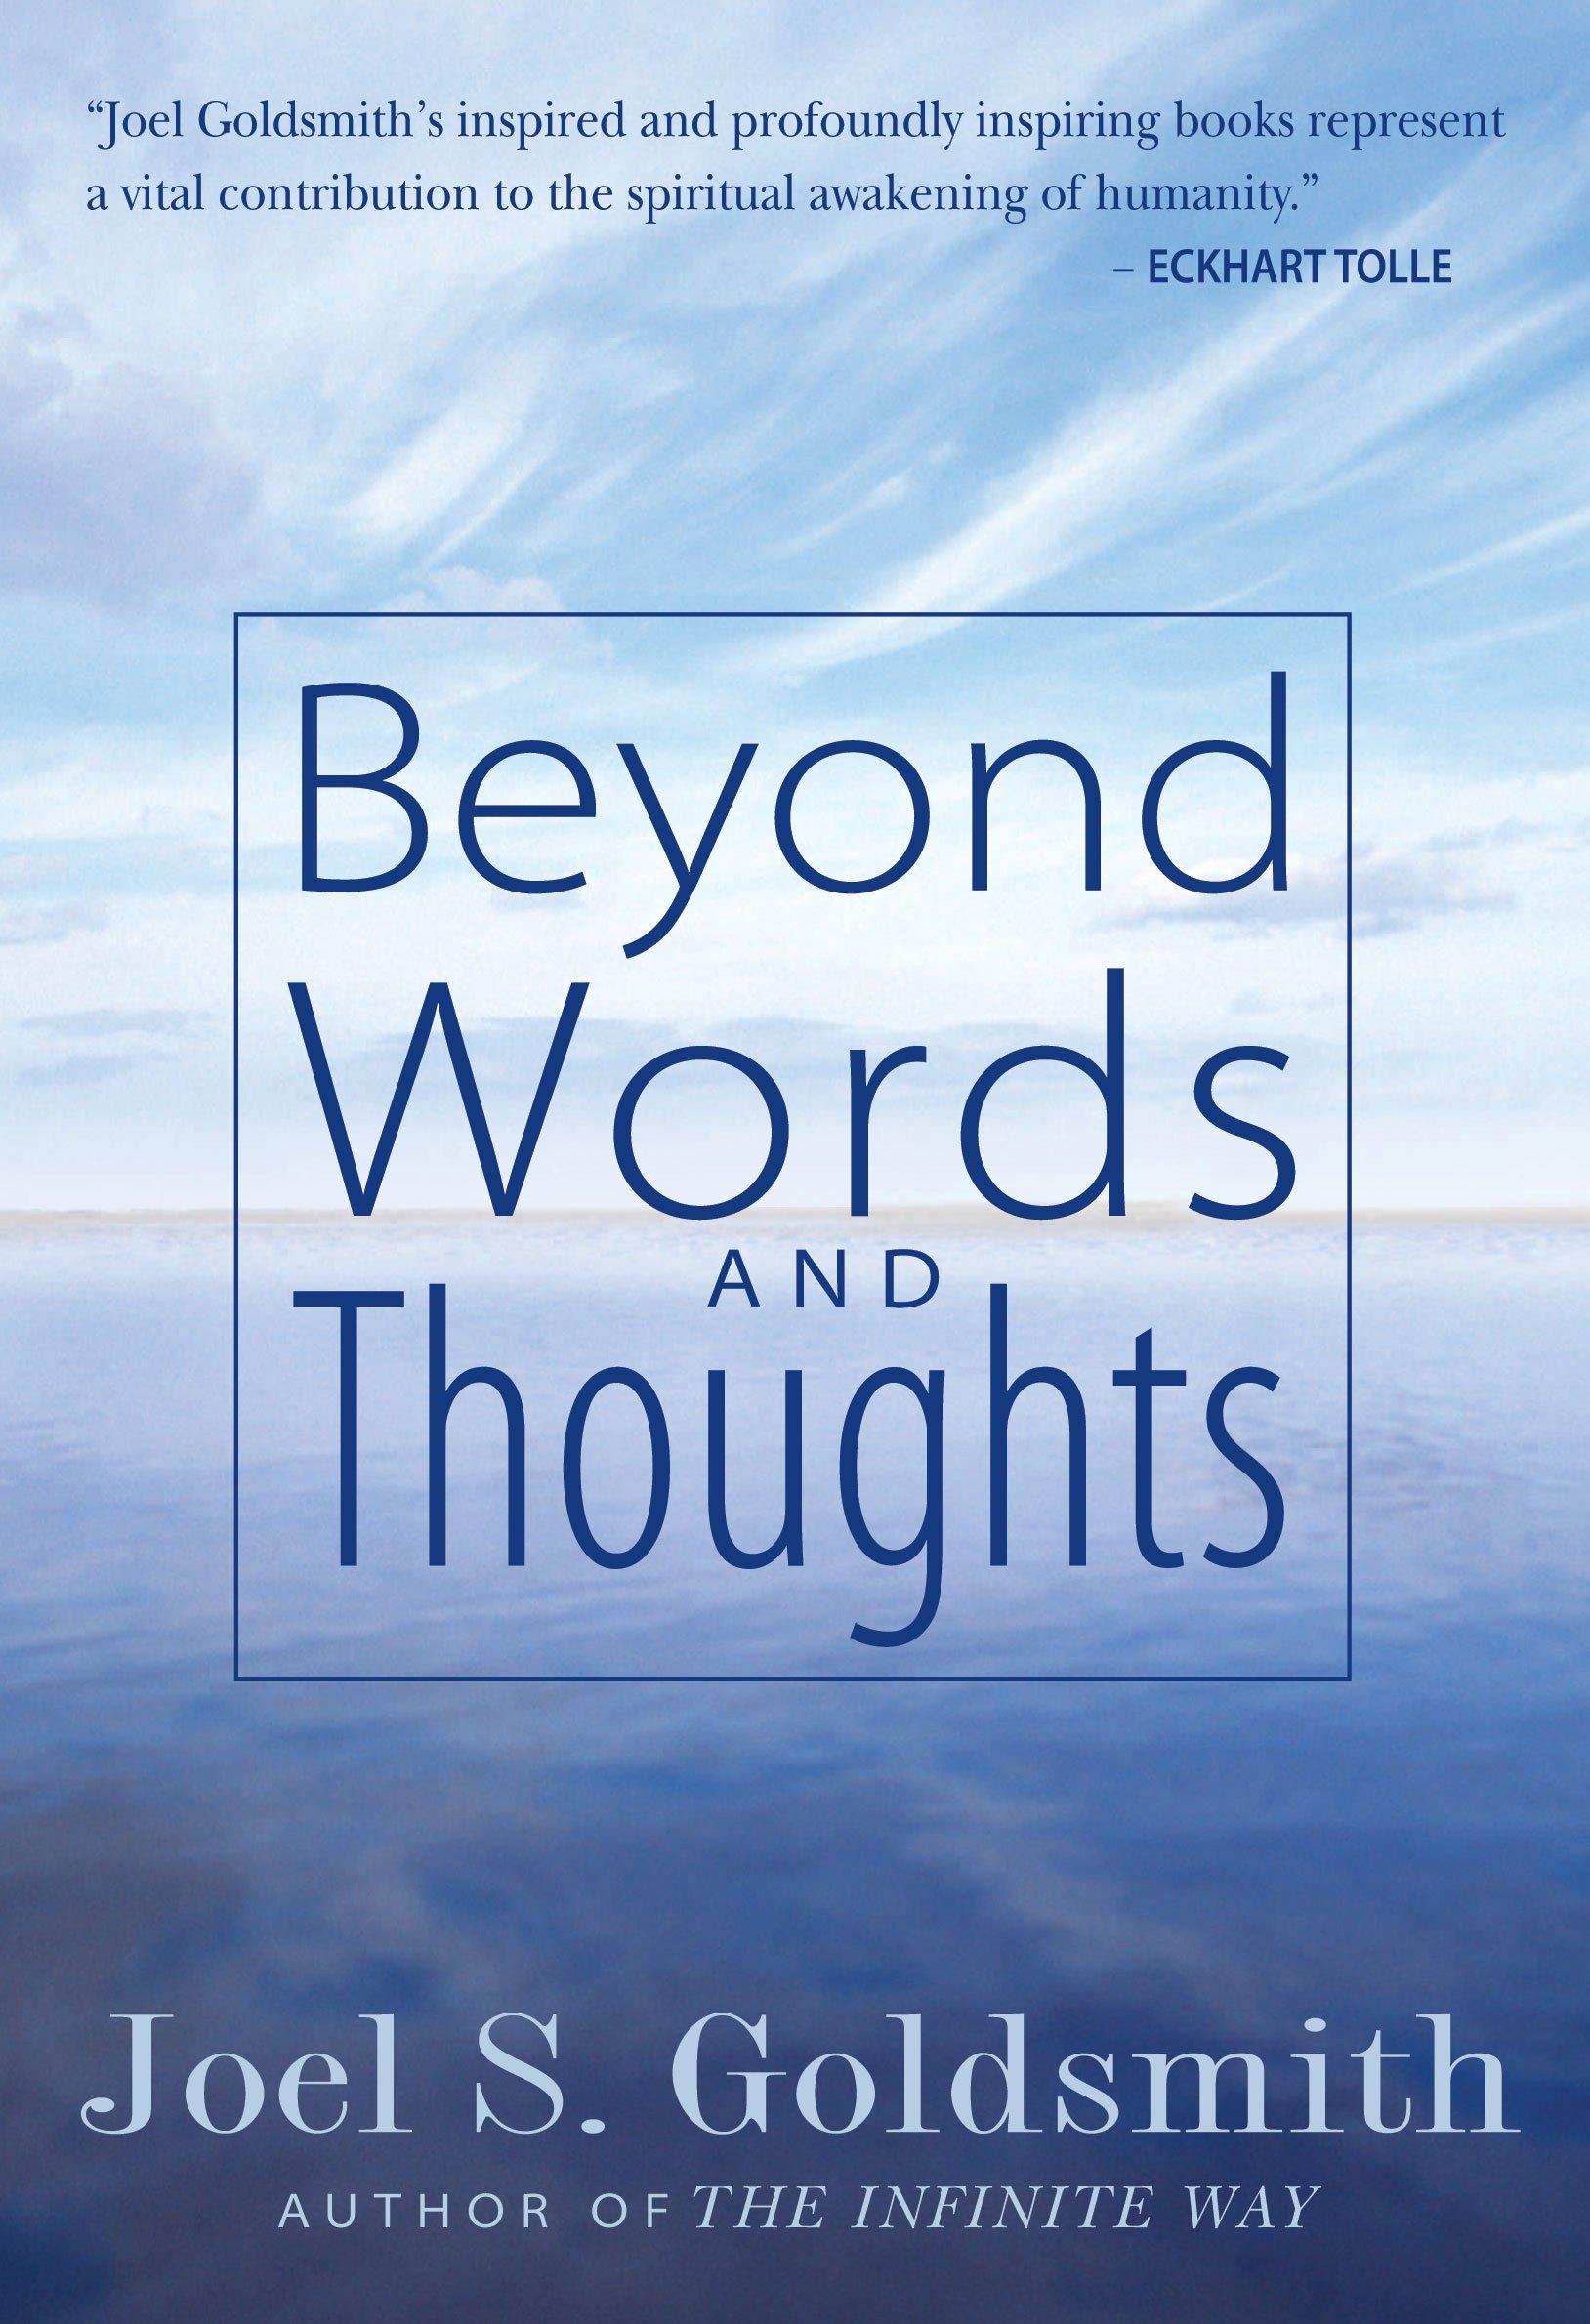 Beyond words and thoughts joel s goldsmith lorraine sinkler joel s goldsmith 9781889051369 amazon com books